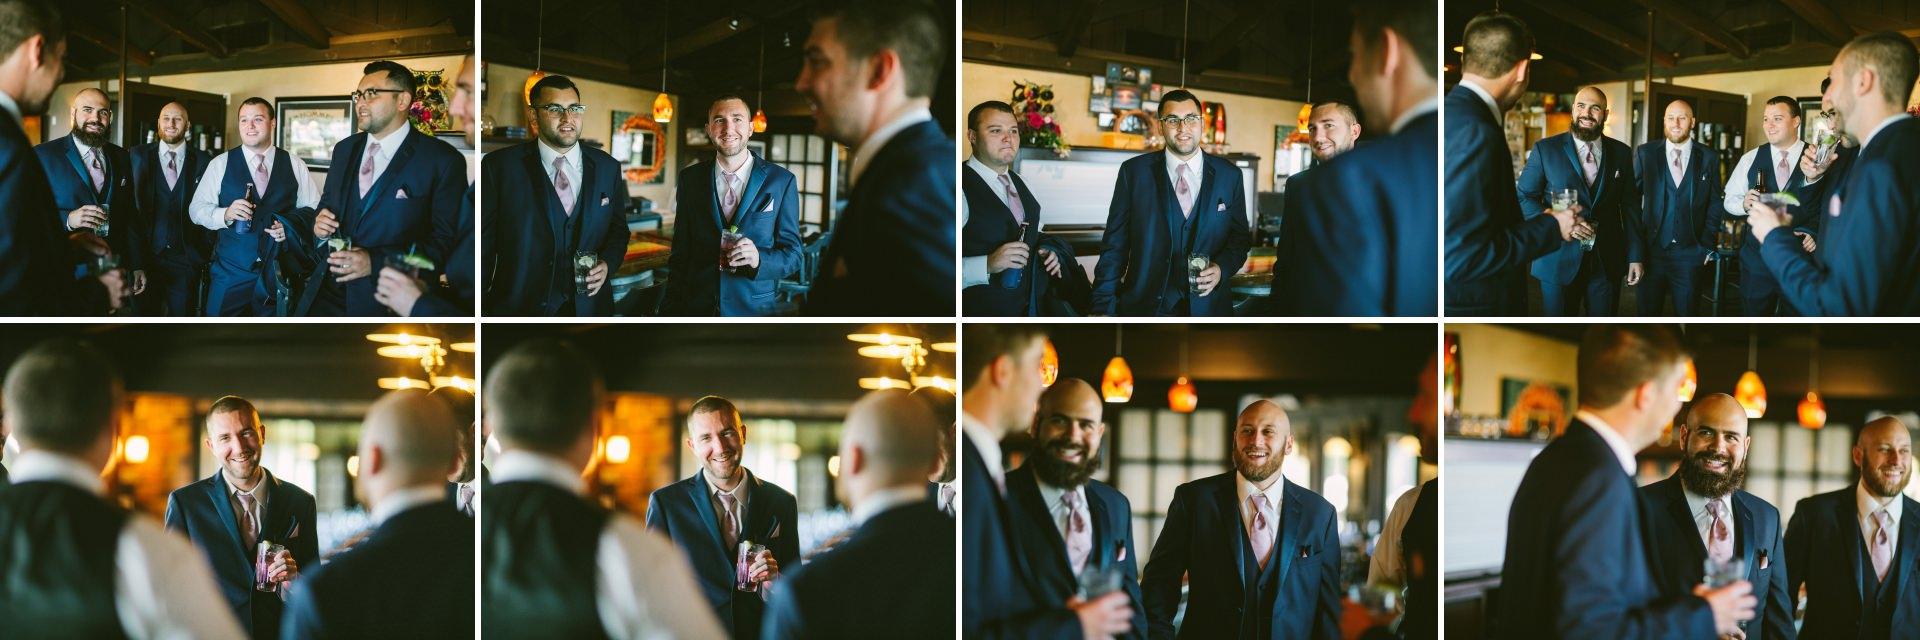 Catawba Island Club Wedding Photographer 1 7.jpg